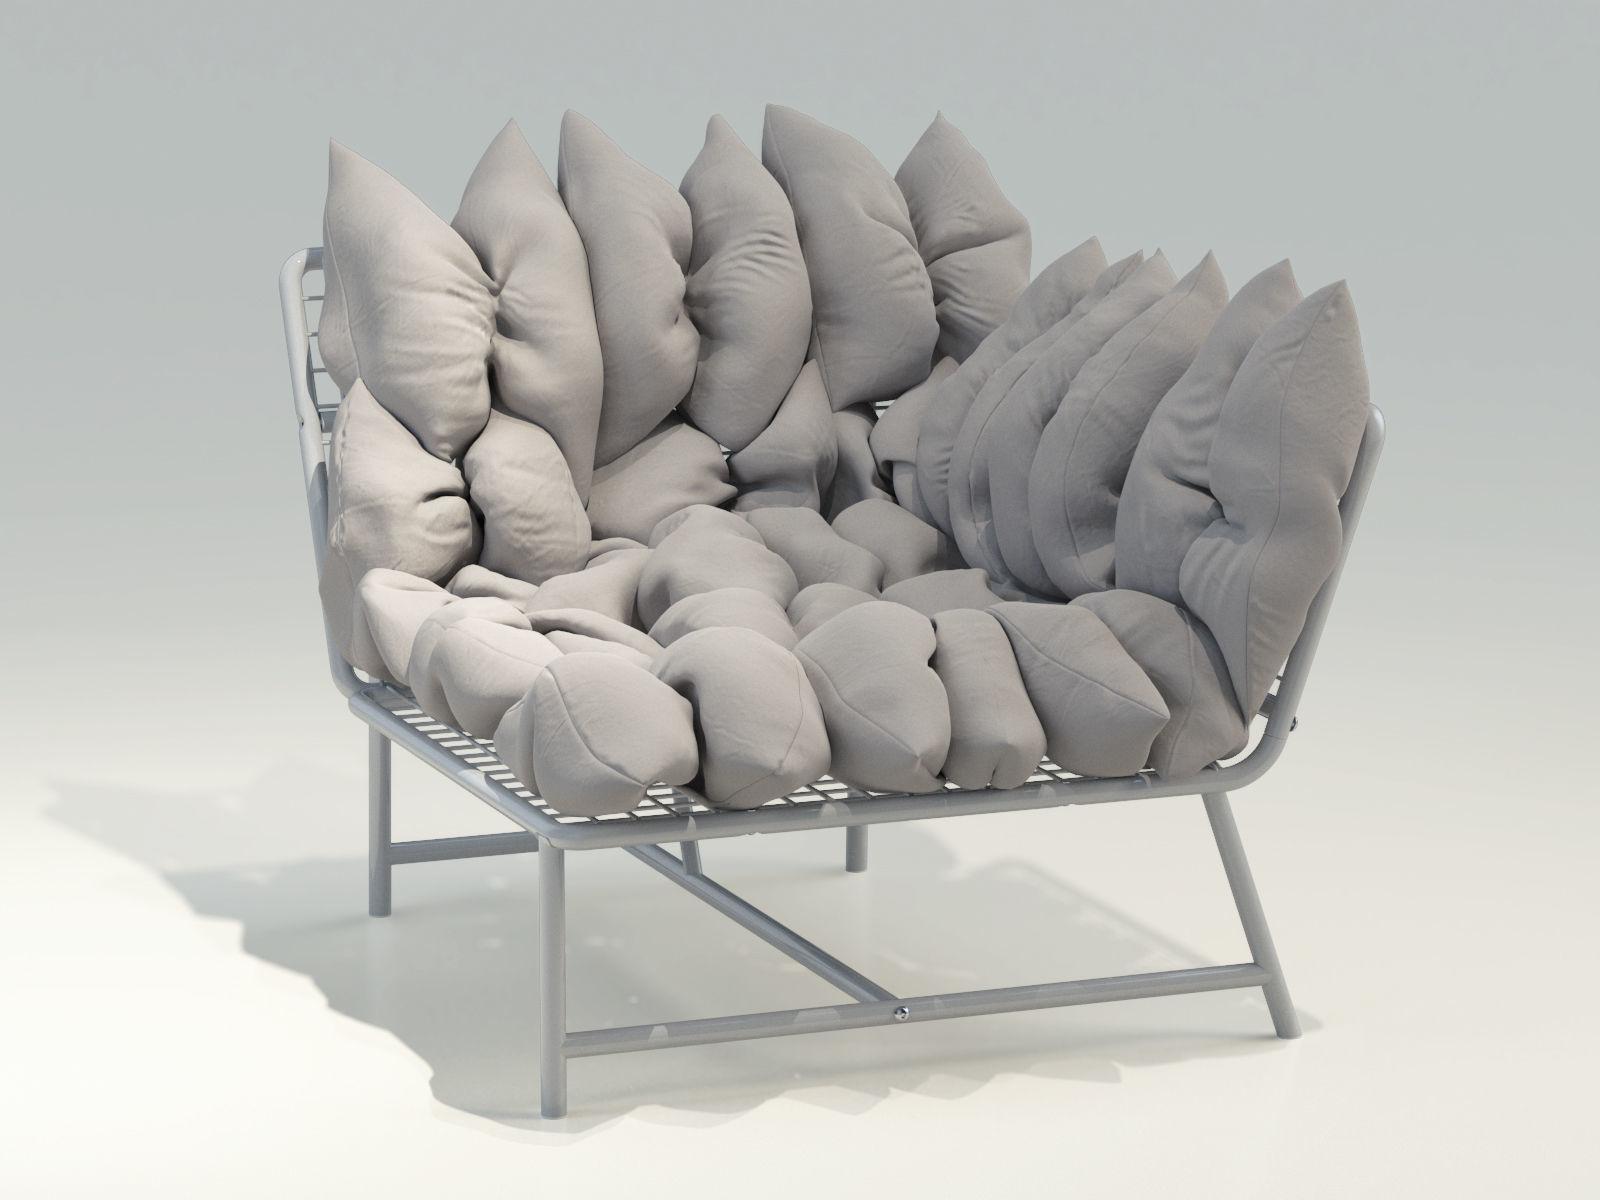 Ikea Ps 2017 Corner Easy Chair Left Model Max Obj Mtl Fbx 2